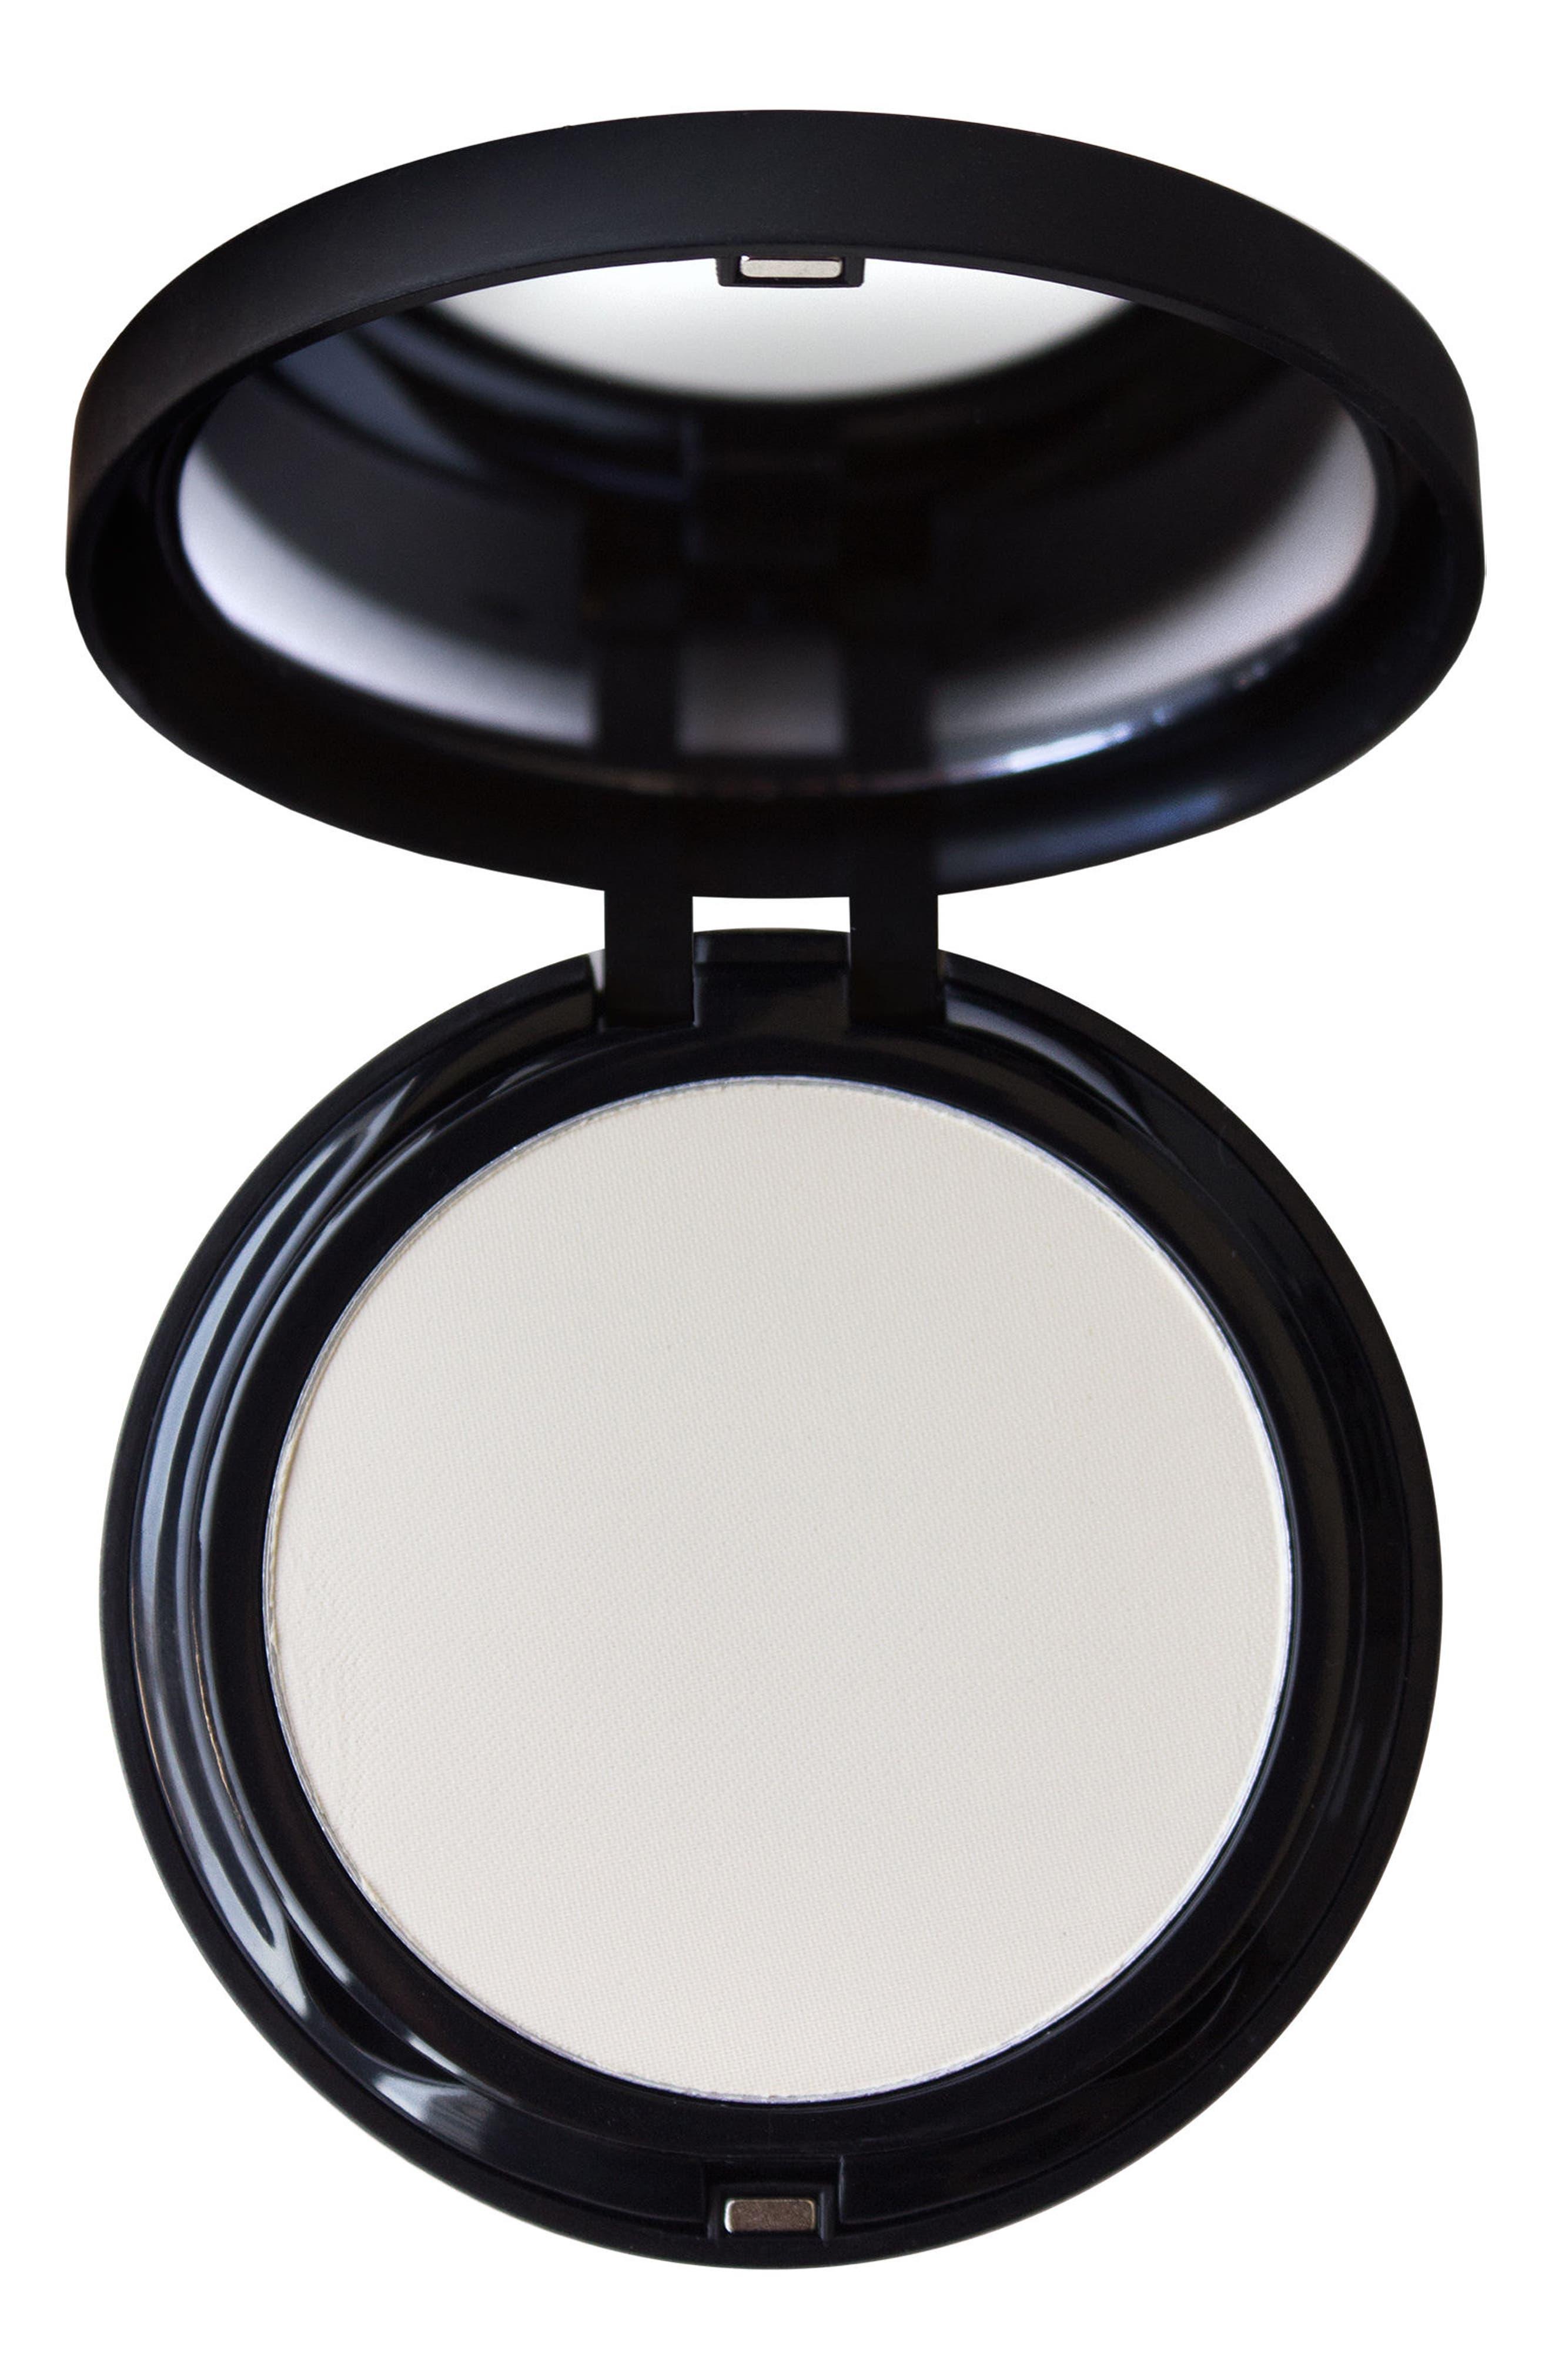 PRO Blurring Translucent Pressed Powder,                             Main thumbnail 1, color,                             000